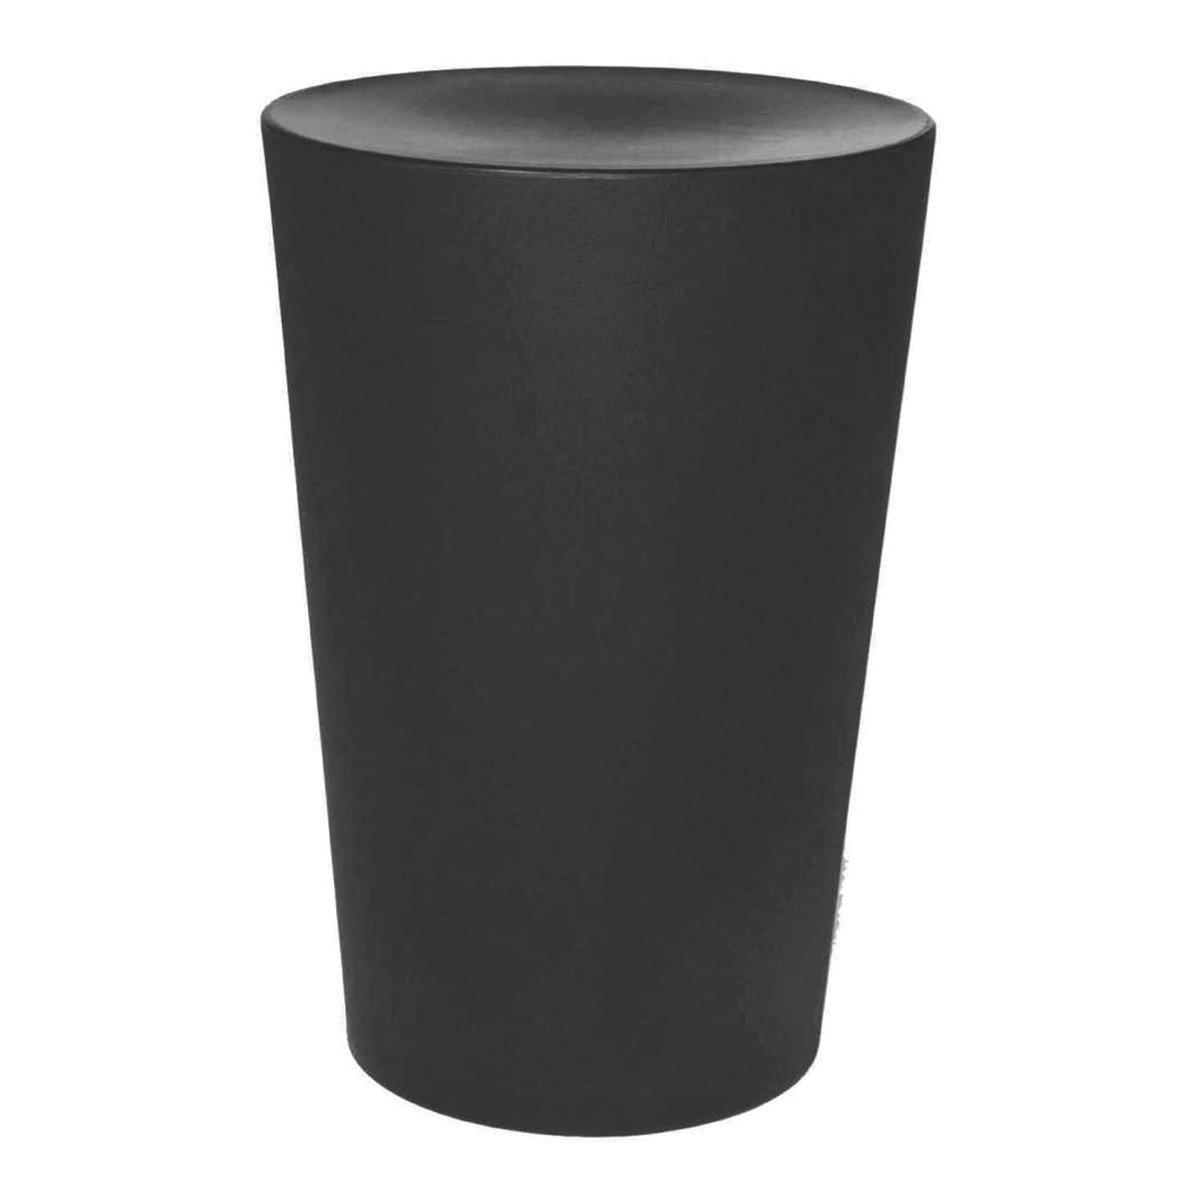 Moooi Container Kruk